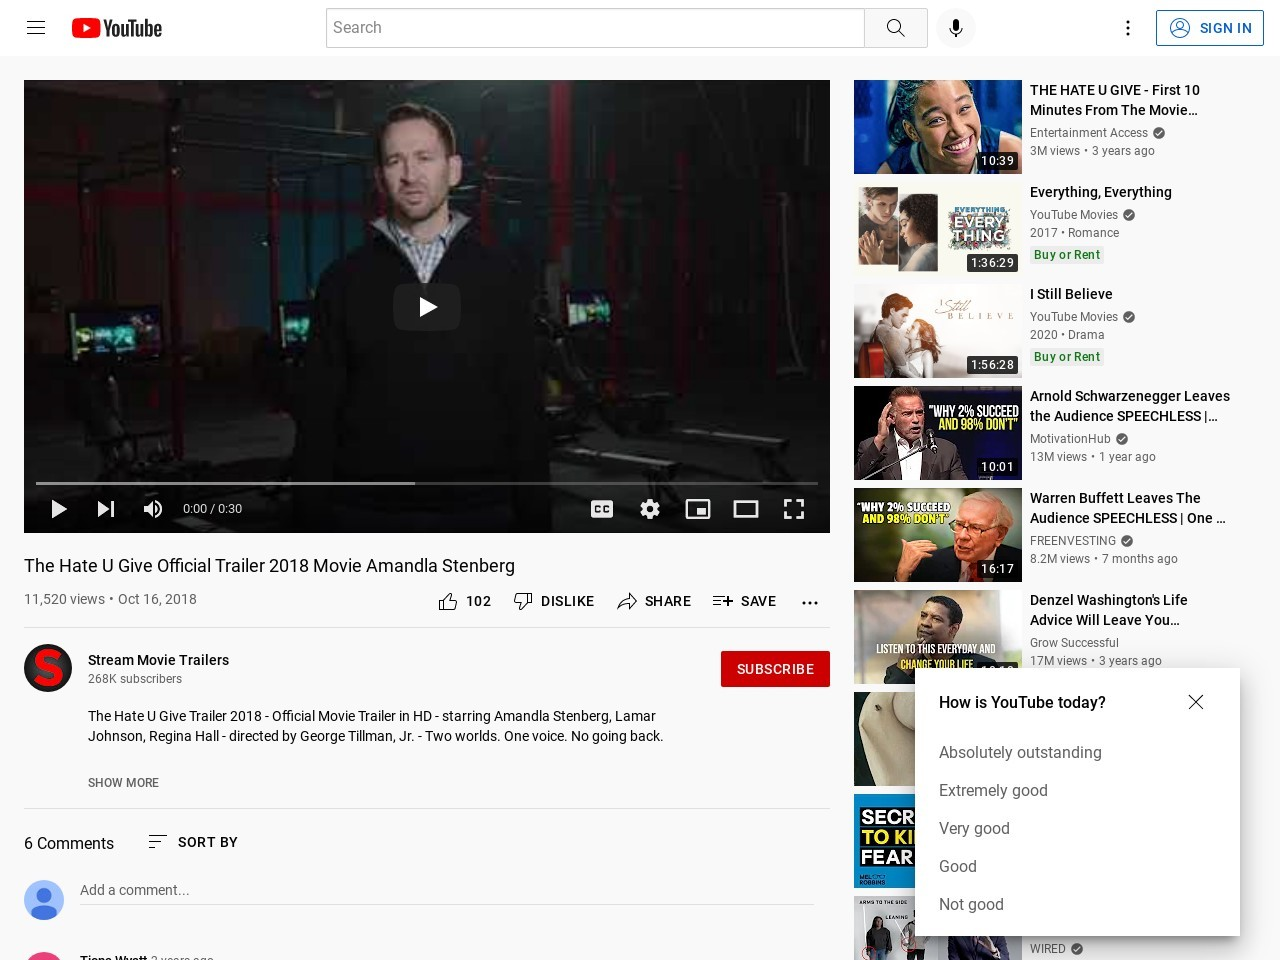 The Hate U Give Official Trailer 2018 Movie Amandla Stenberg